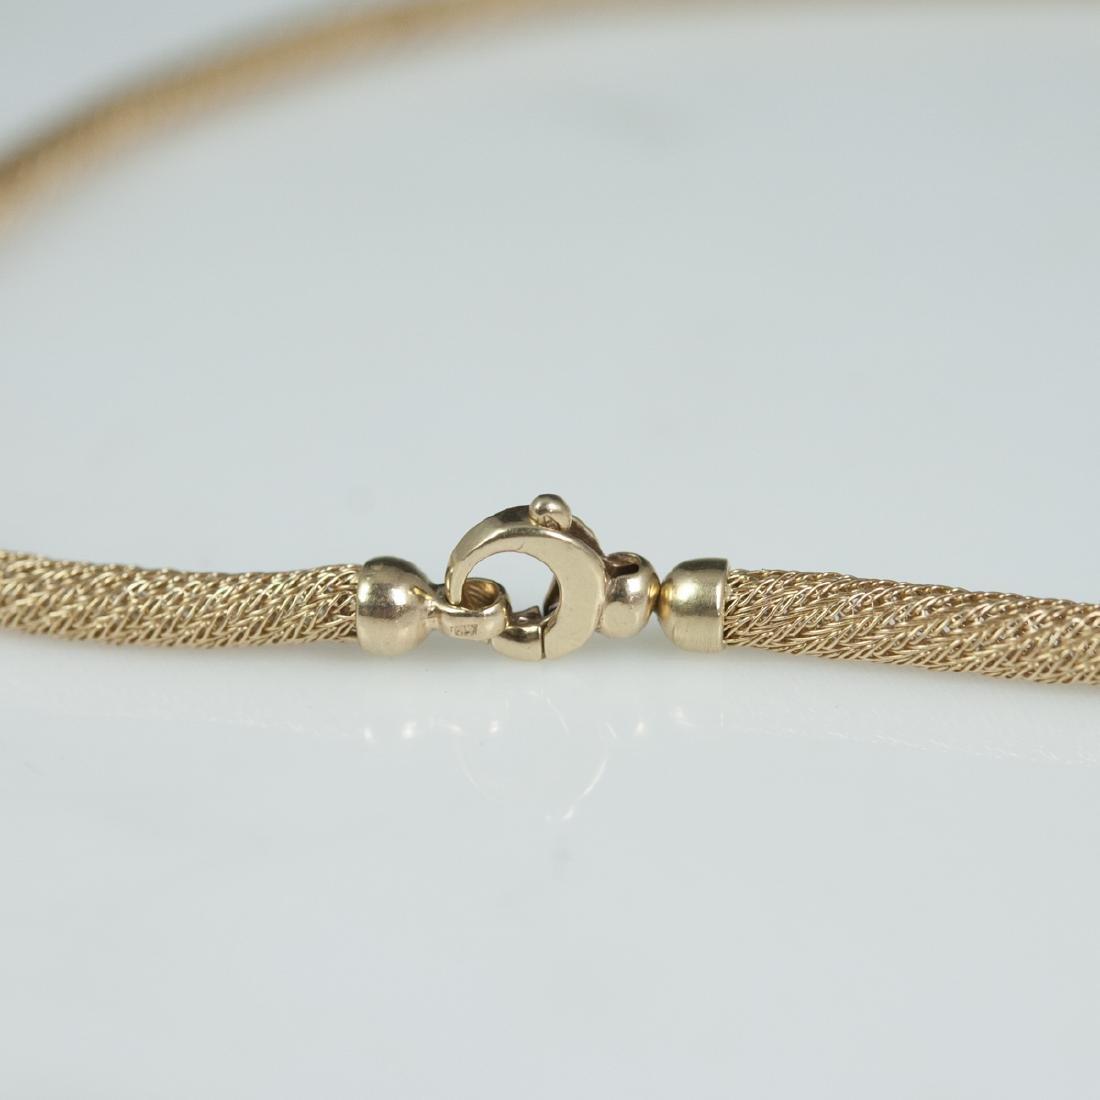 Vintage Italian 14kt Gold Necklace - 2